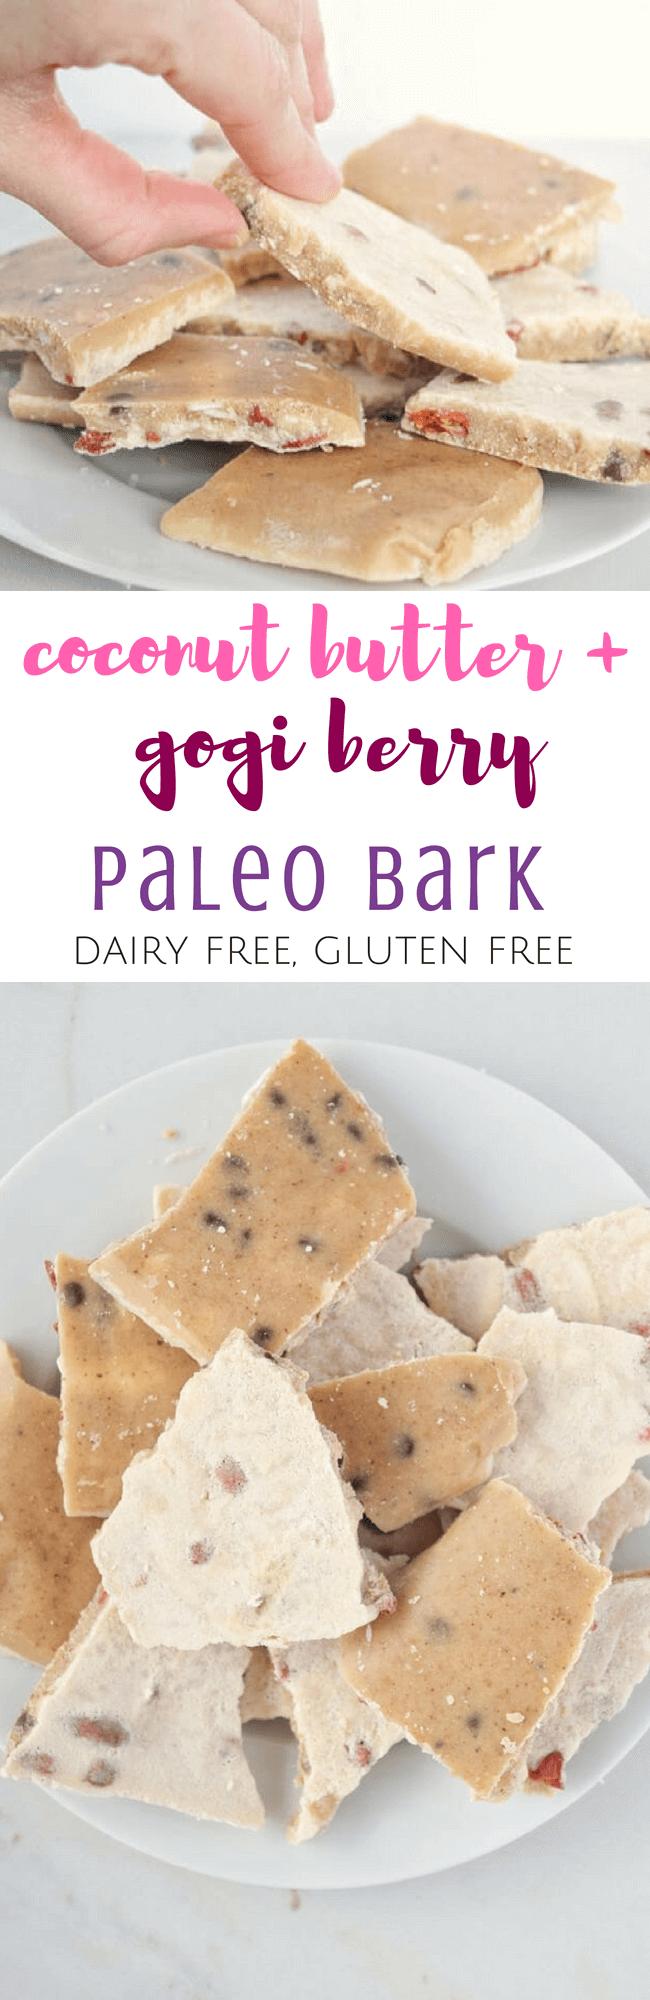 Coconut Butter + Goji Berry Paleo Bark (Dairy Free) | Personally Paleo